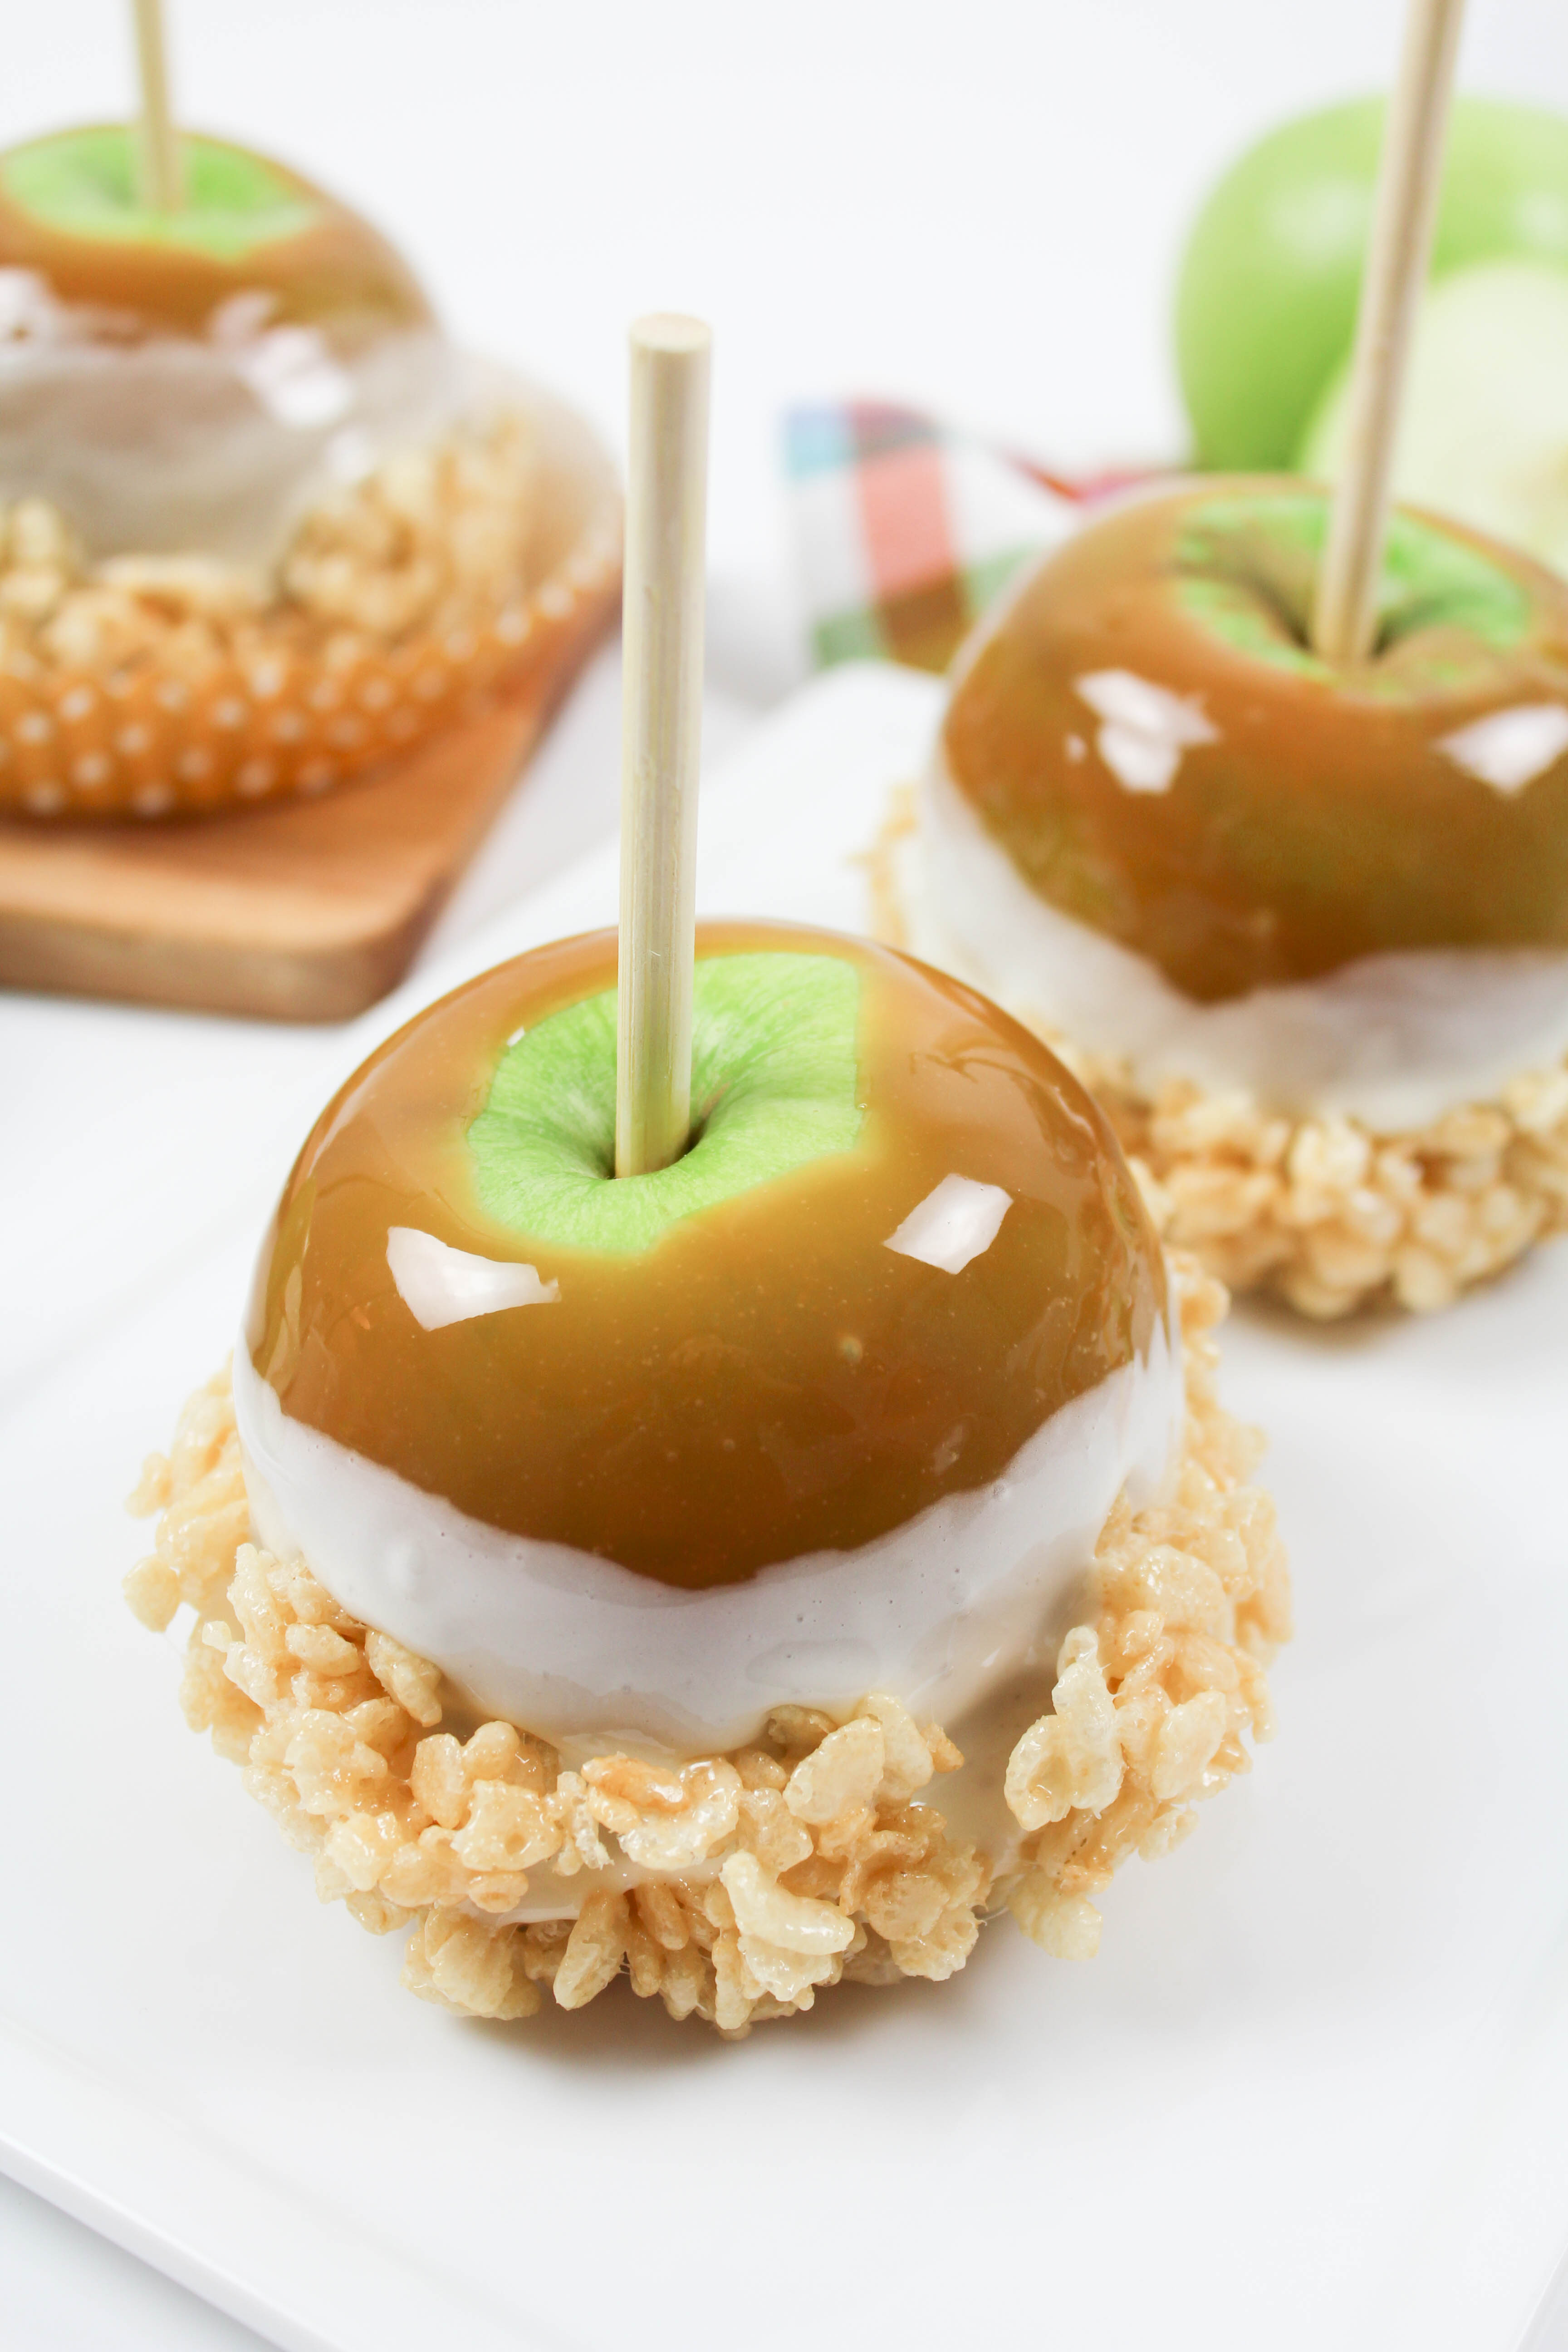 Marshmallow Cereal Treat Caramel Apples - Let's Mingle Blog